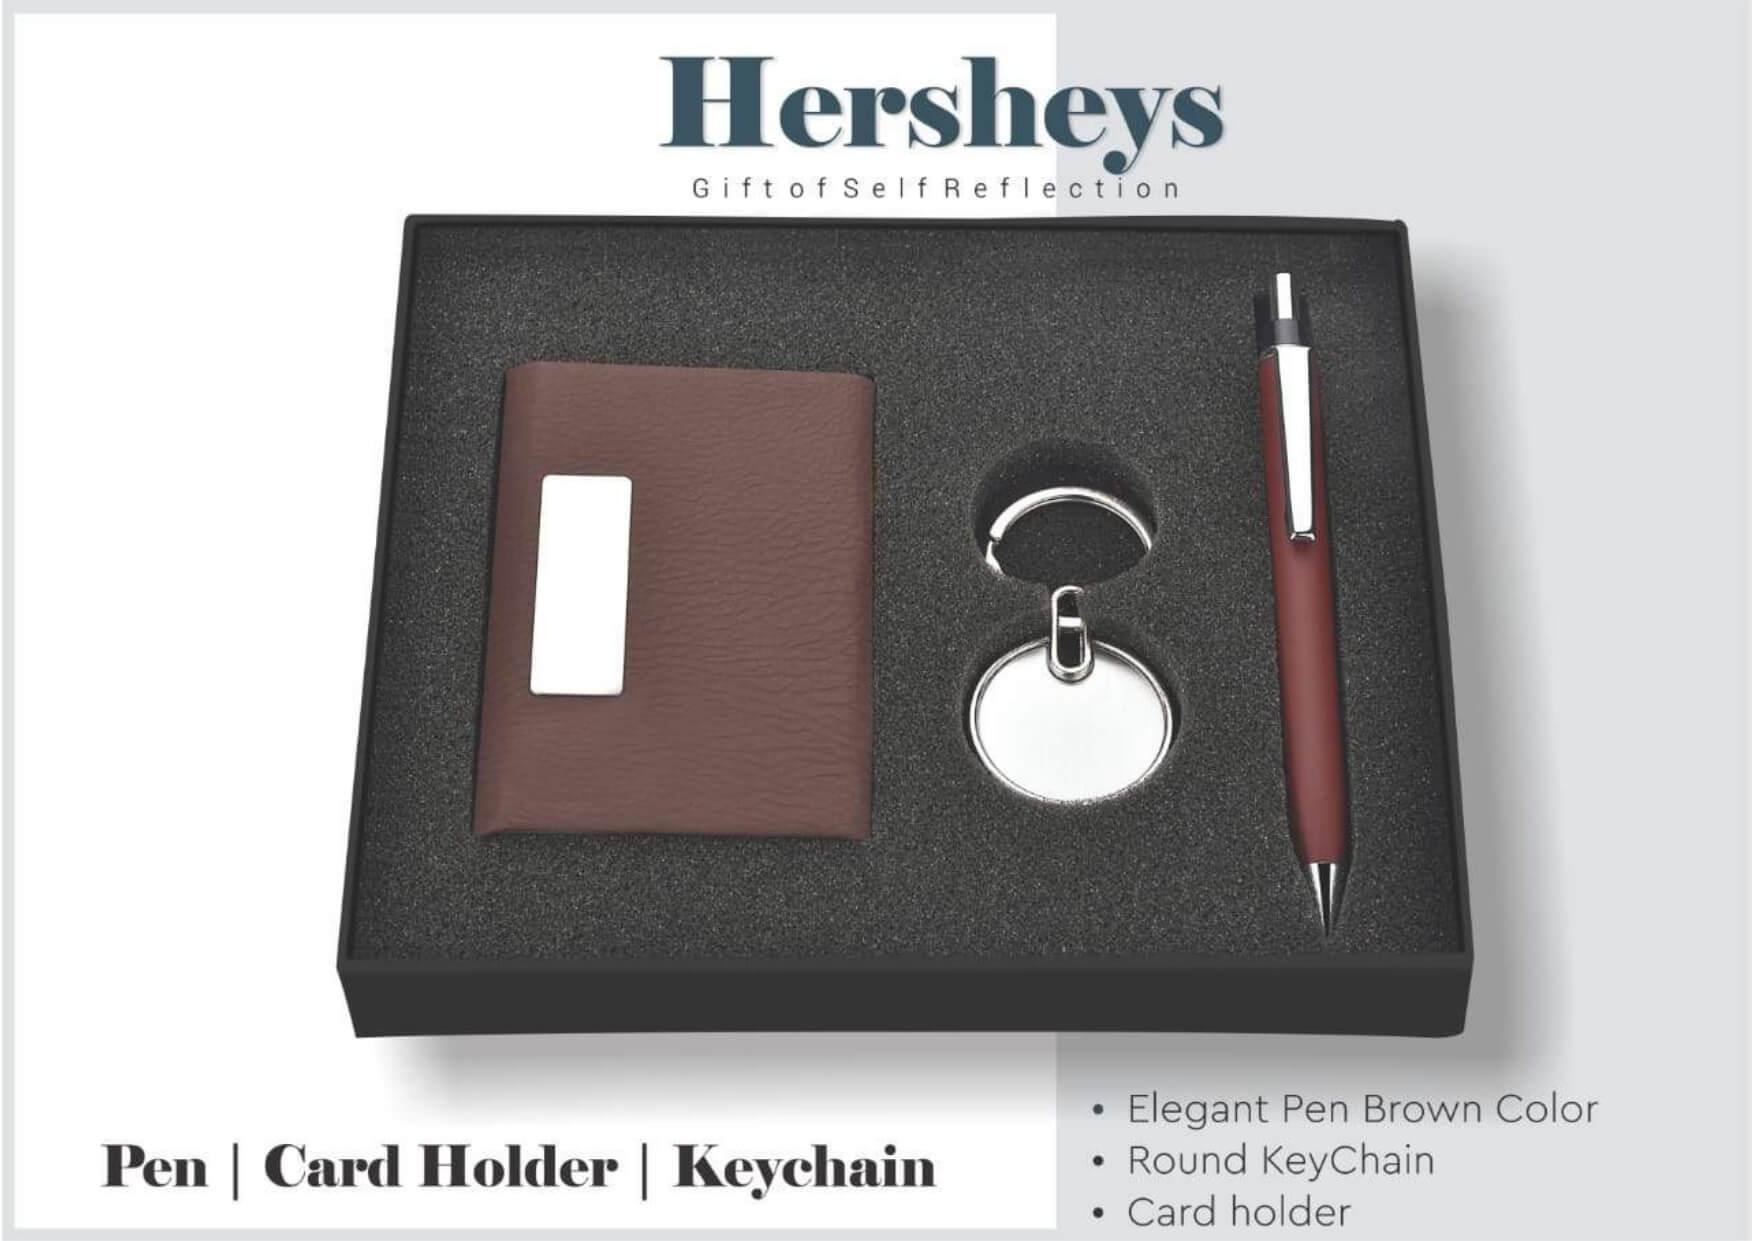 Card Holder, Pen And Keychain Set (3 in 1) Hersheys